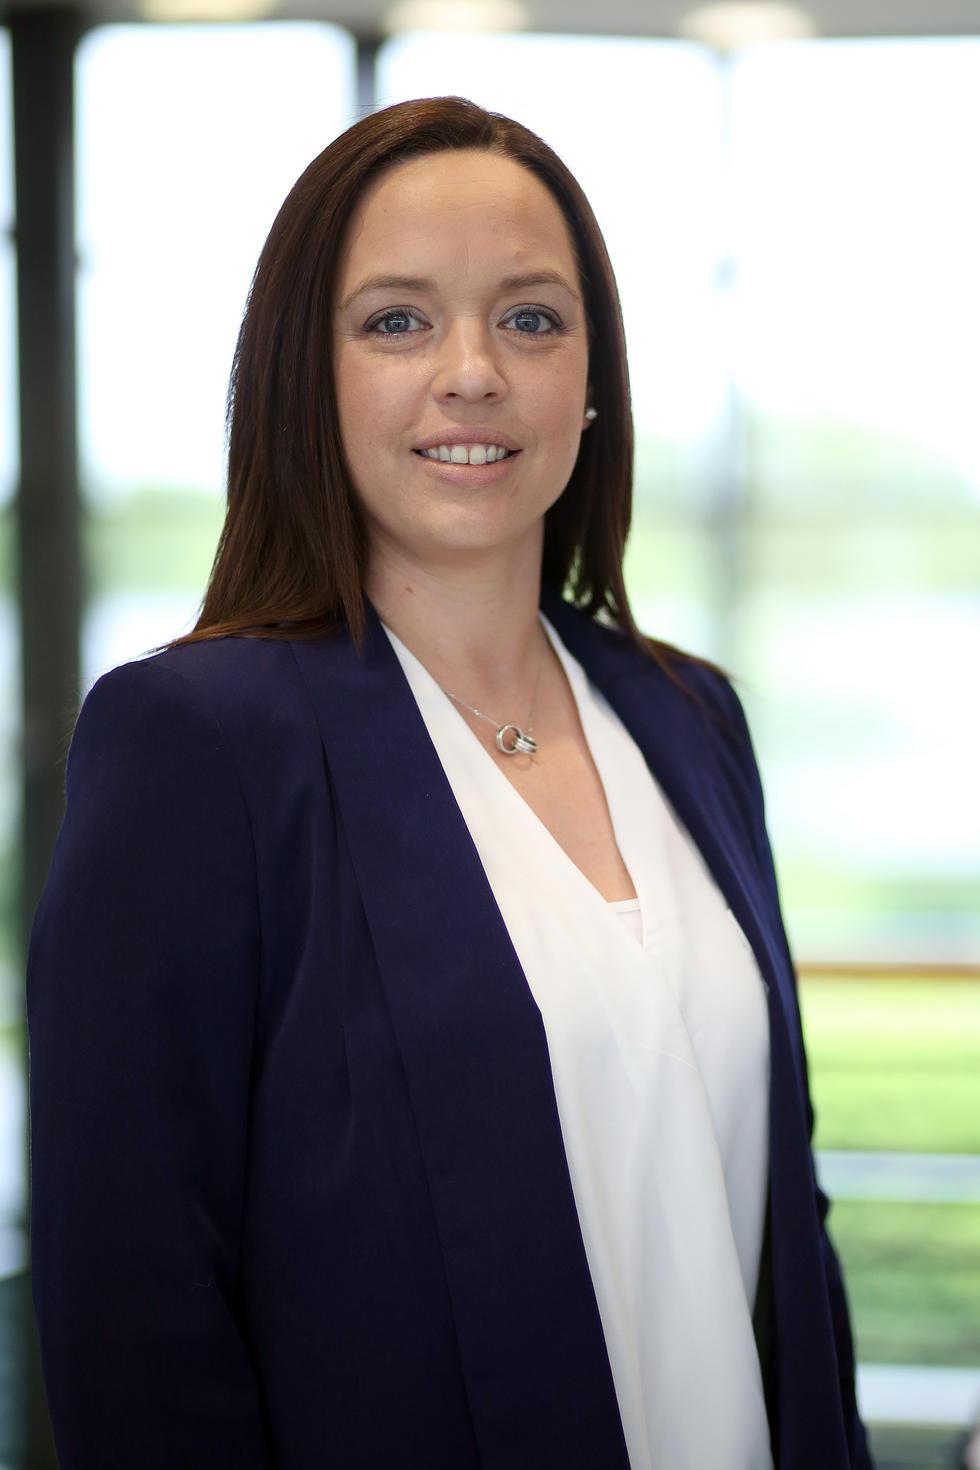 Sharon Starkey, Resolution Communications, Associate - Members´ Editorial